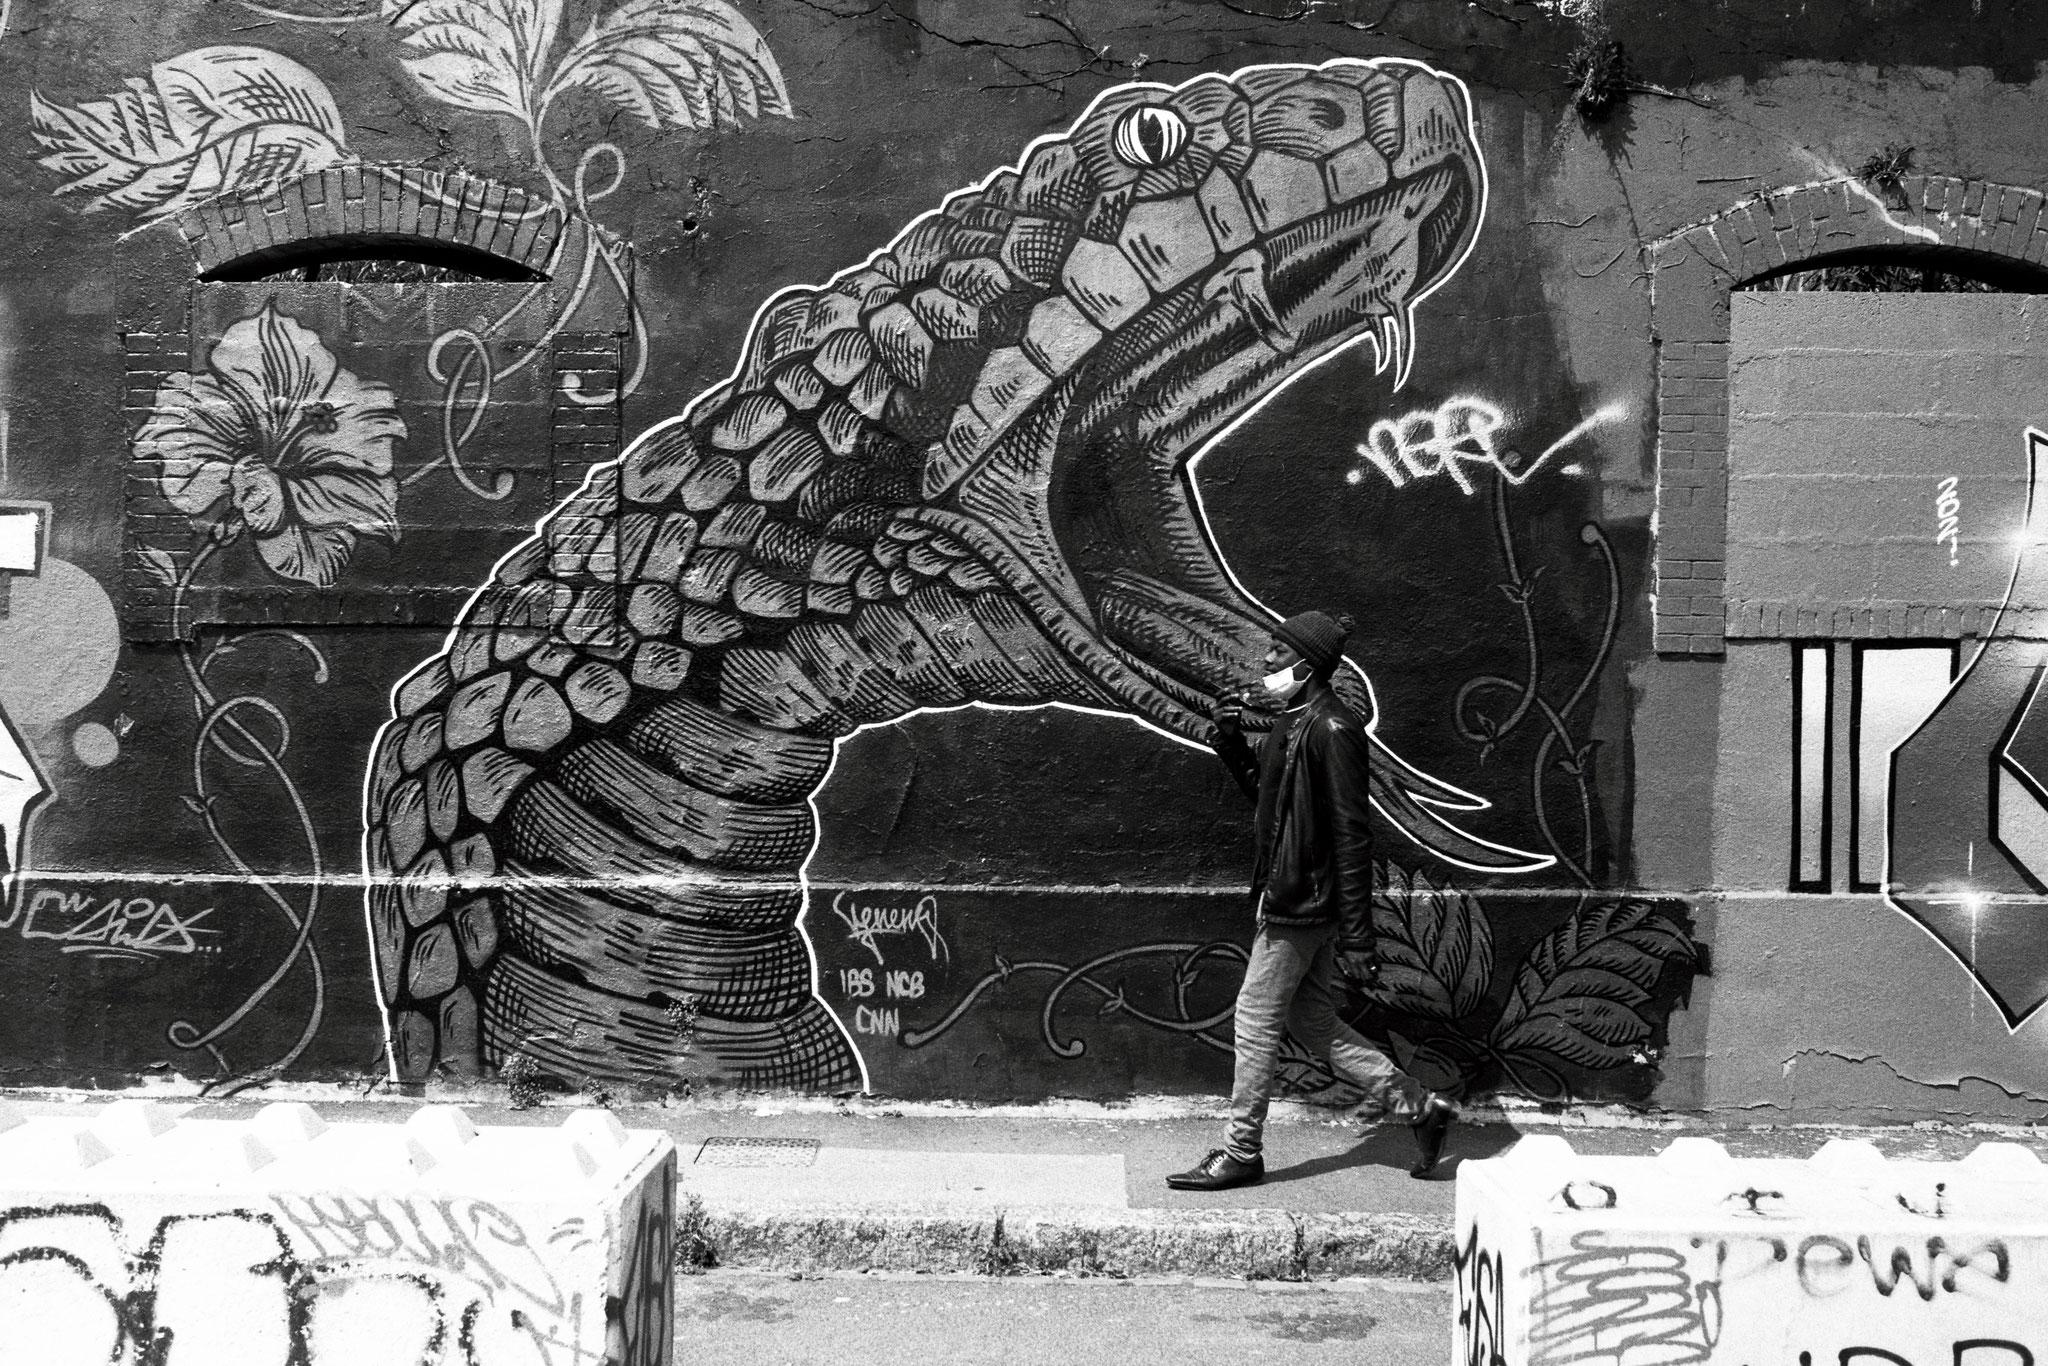 """The snake"" - Nantes (2021). Ilford FP4 Plus 125 ASA"